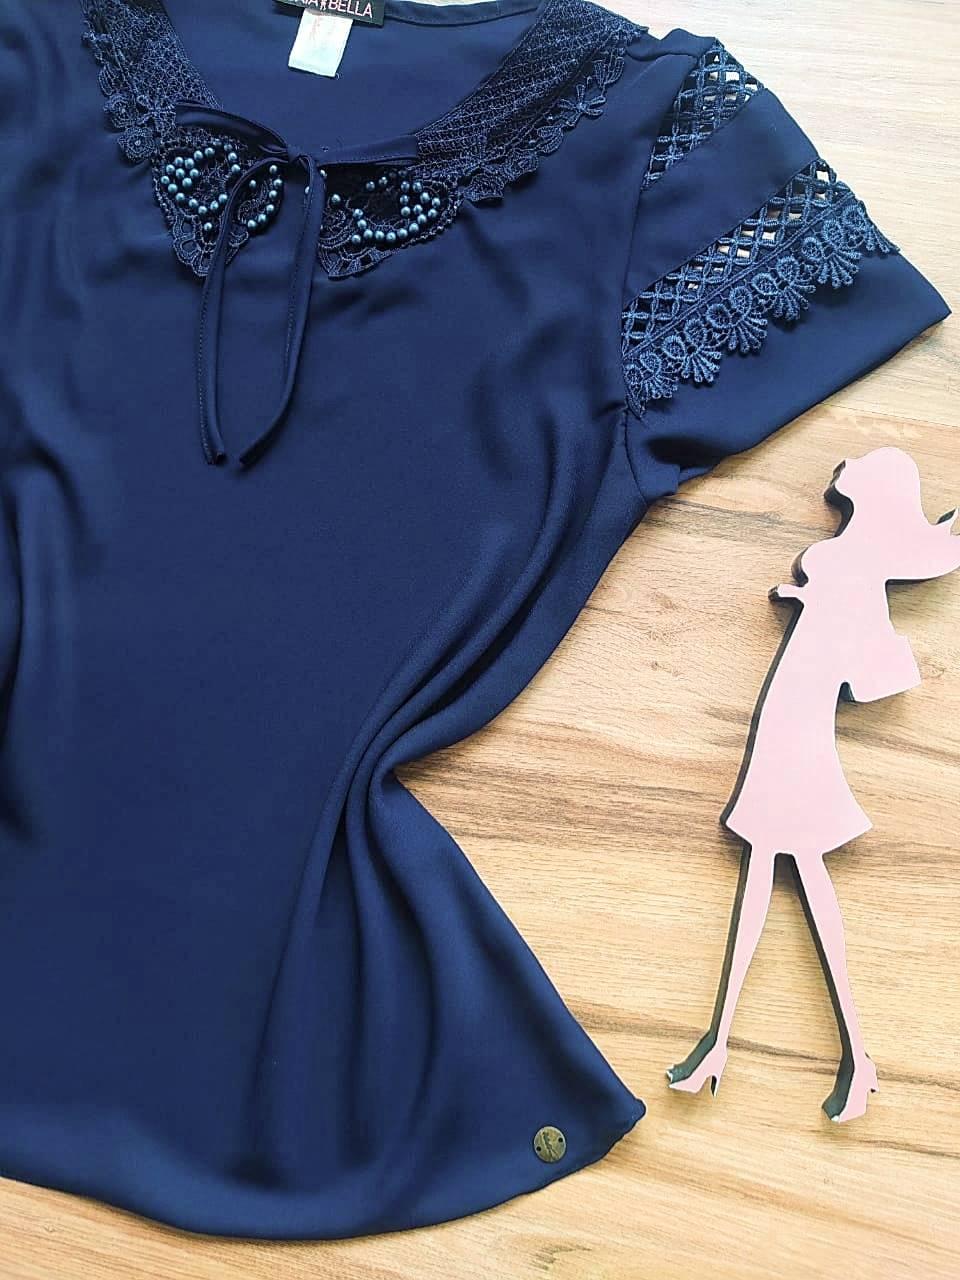 Blusa Louise de Renda Saia Bella - SB741020 Azul Marinho